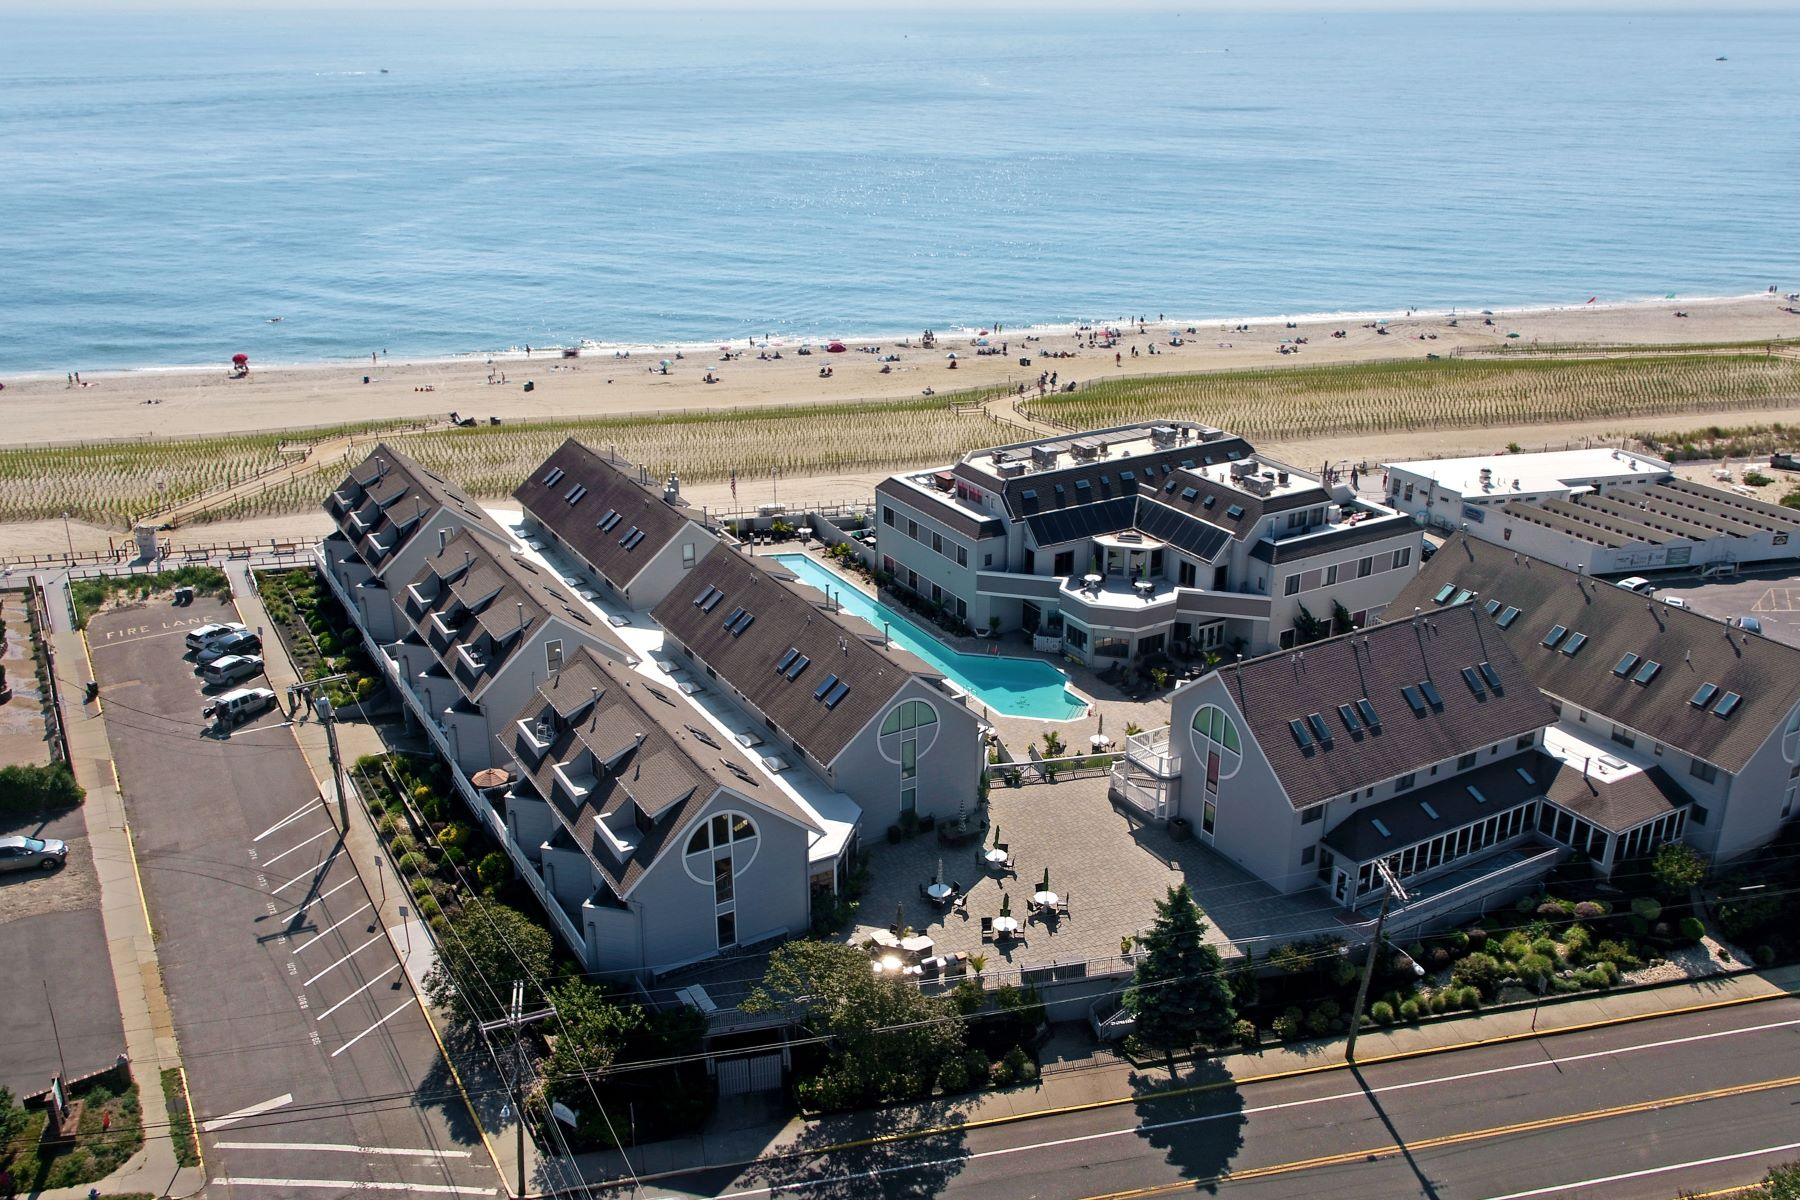 Condominiums для того Продажа на Where the Sunrise Meets the Sand 900 Ocean Avenue 29, Point Pleasant Beach, Нью-Джерси 08742 Соединенные Штаты